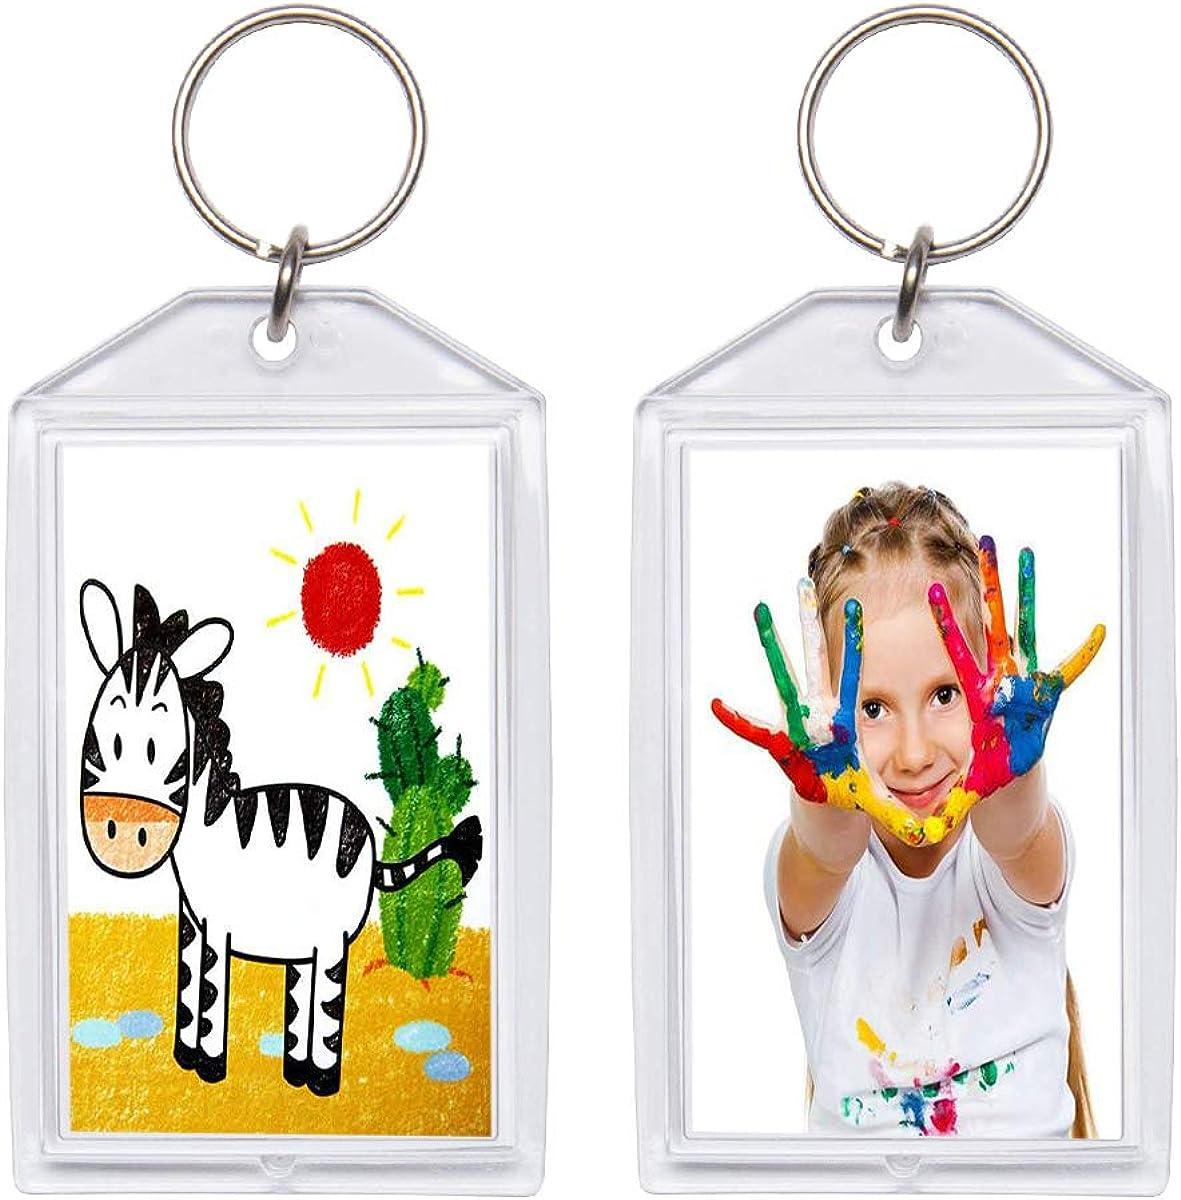 Snap-in Custom Personalised Insert Photo Acrylic Blank Keyring Keychain Wholesale(Size:2